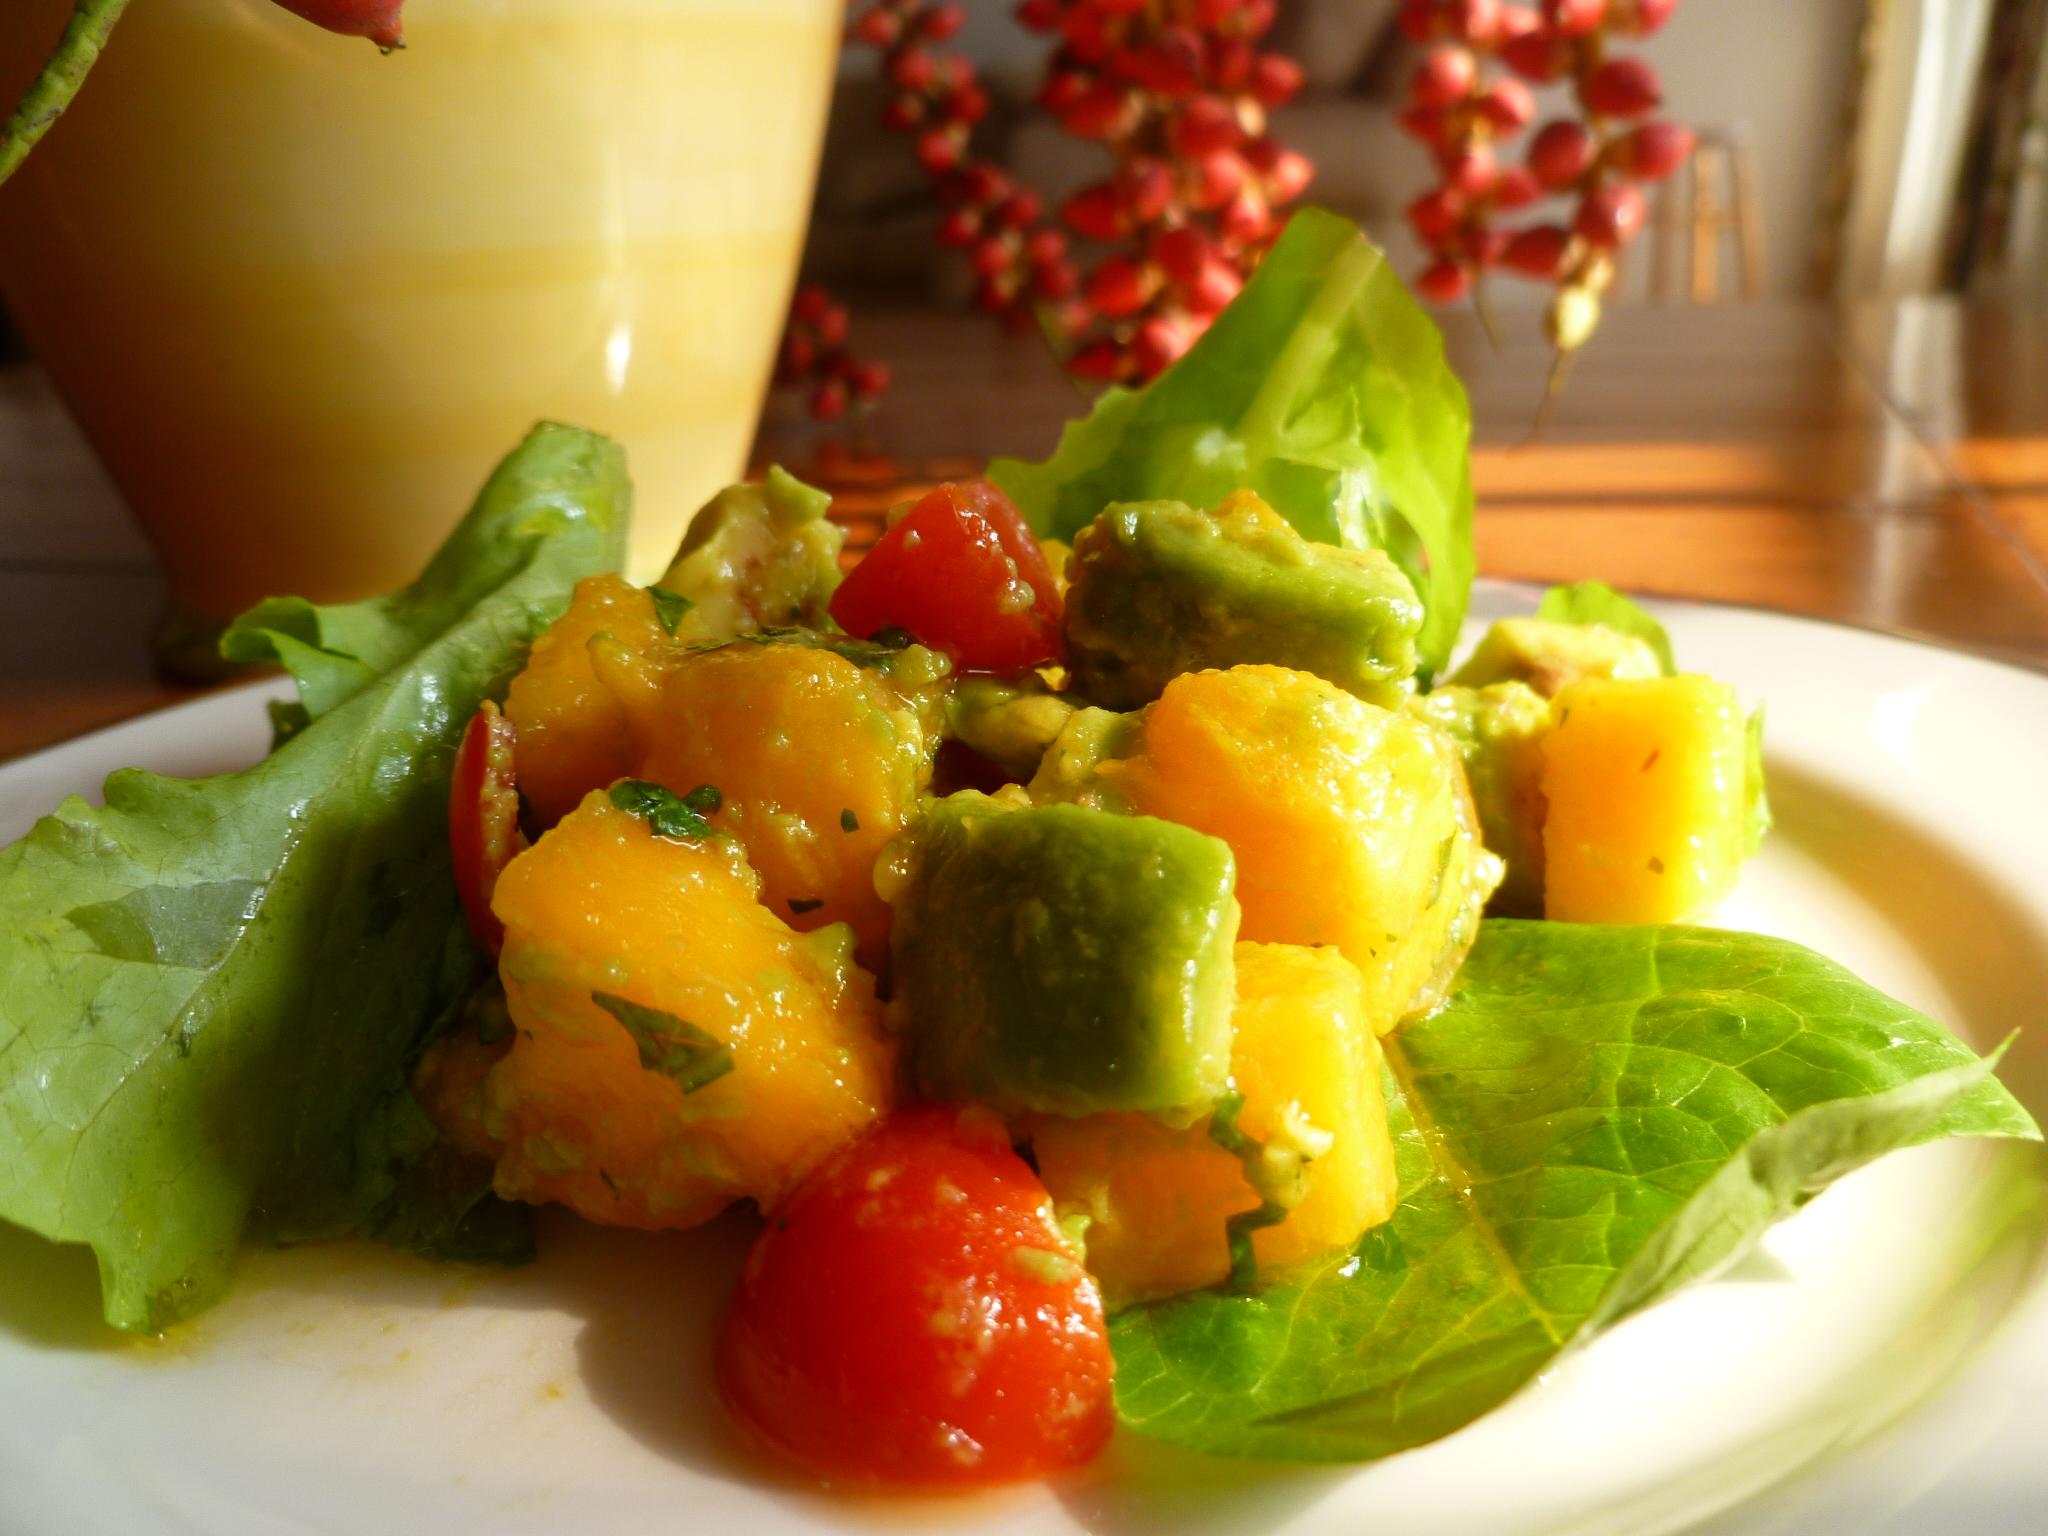 Avocado And Papaya Salad With Louisiana Hot Sauce Marinade